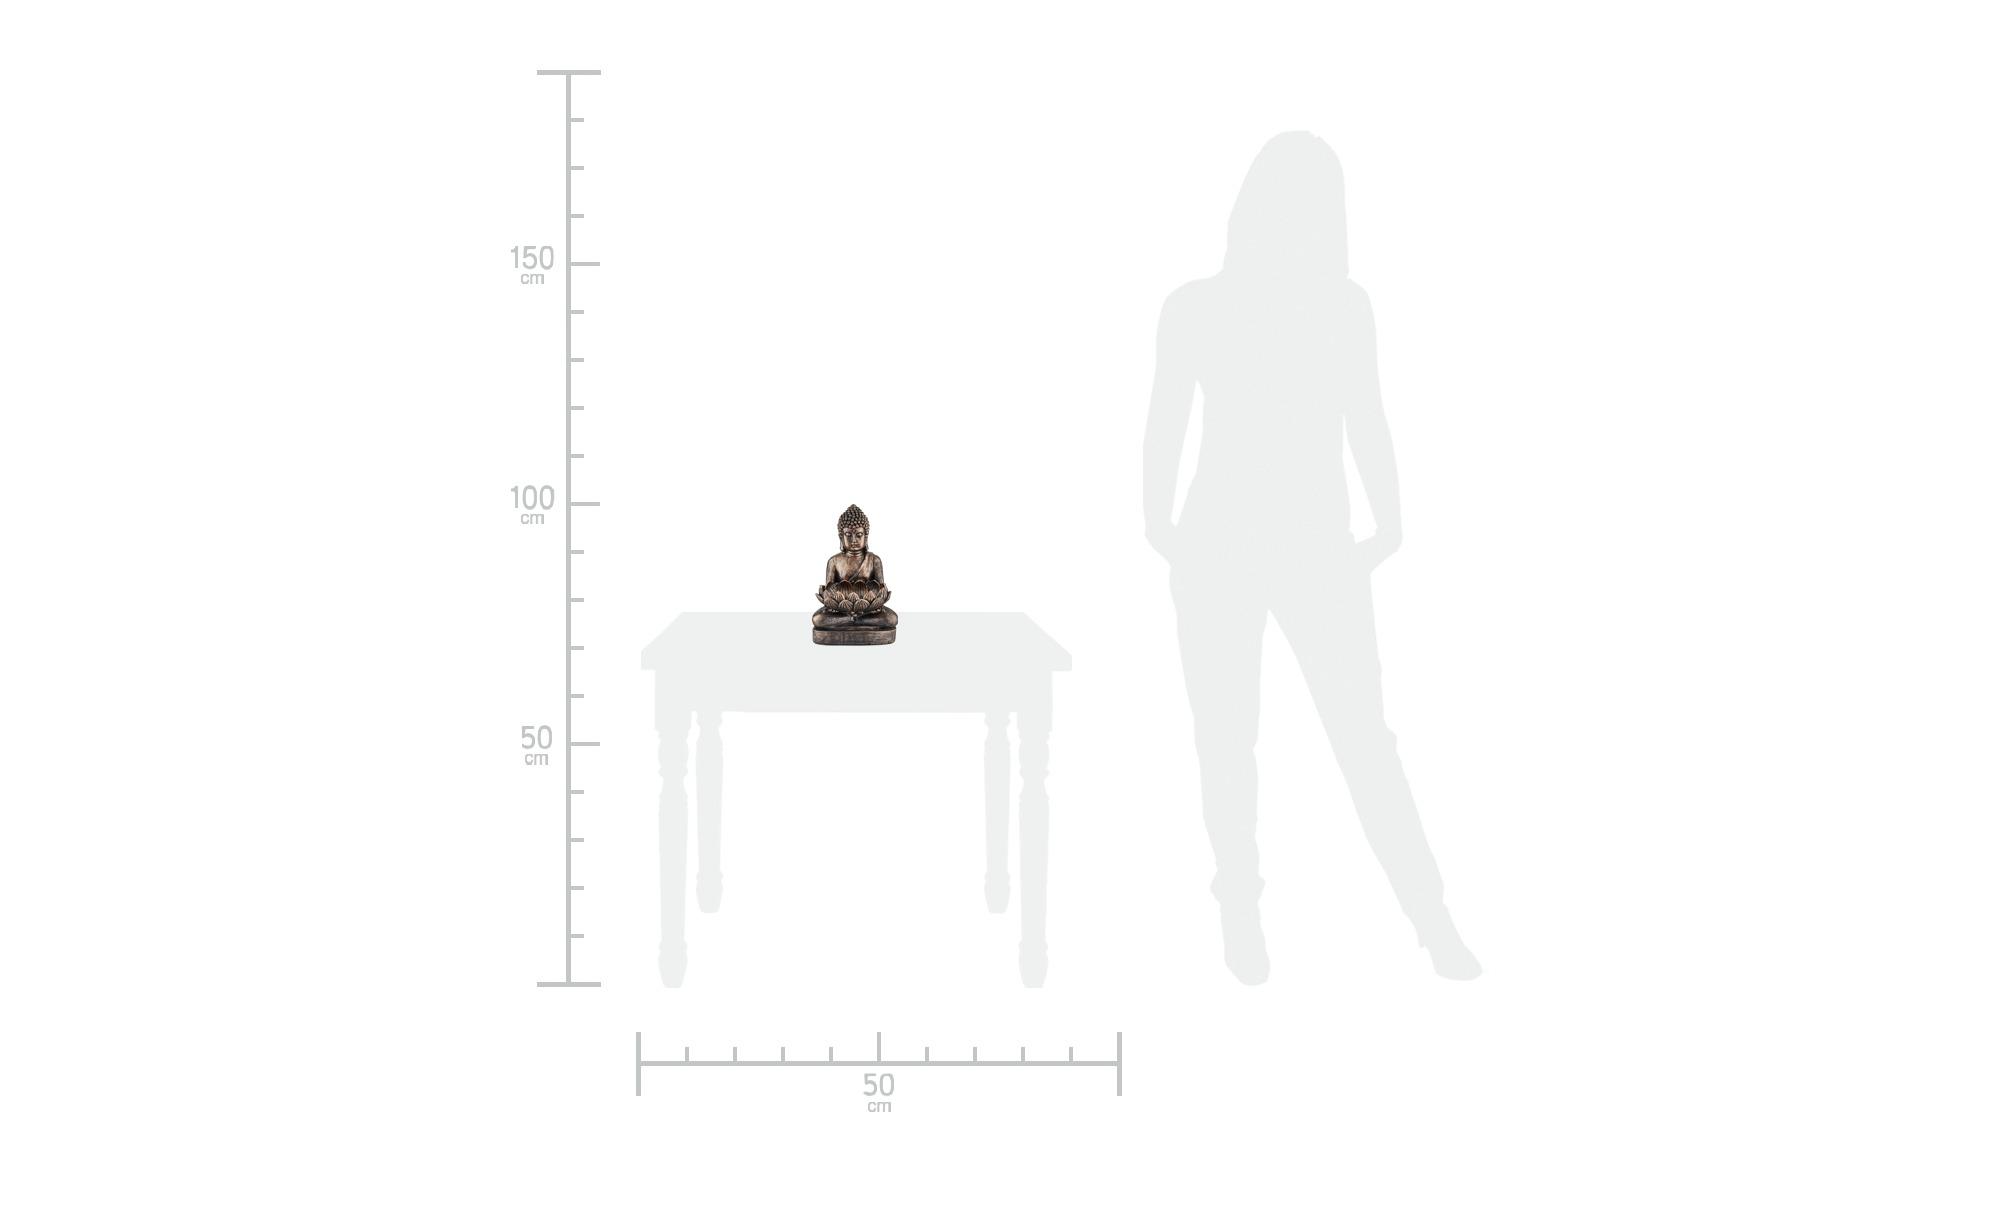 Deko Buddha ¦ kupfer Dekoration > Dekoartikel - Höffner | Dekoration > Wandtattoos > Wanddekoration | Kupfer | Möbel Höffner DE